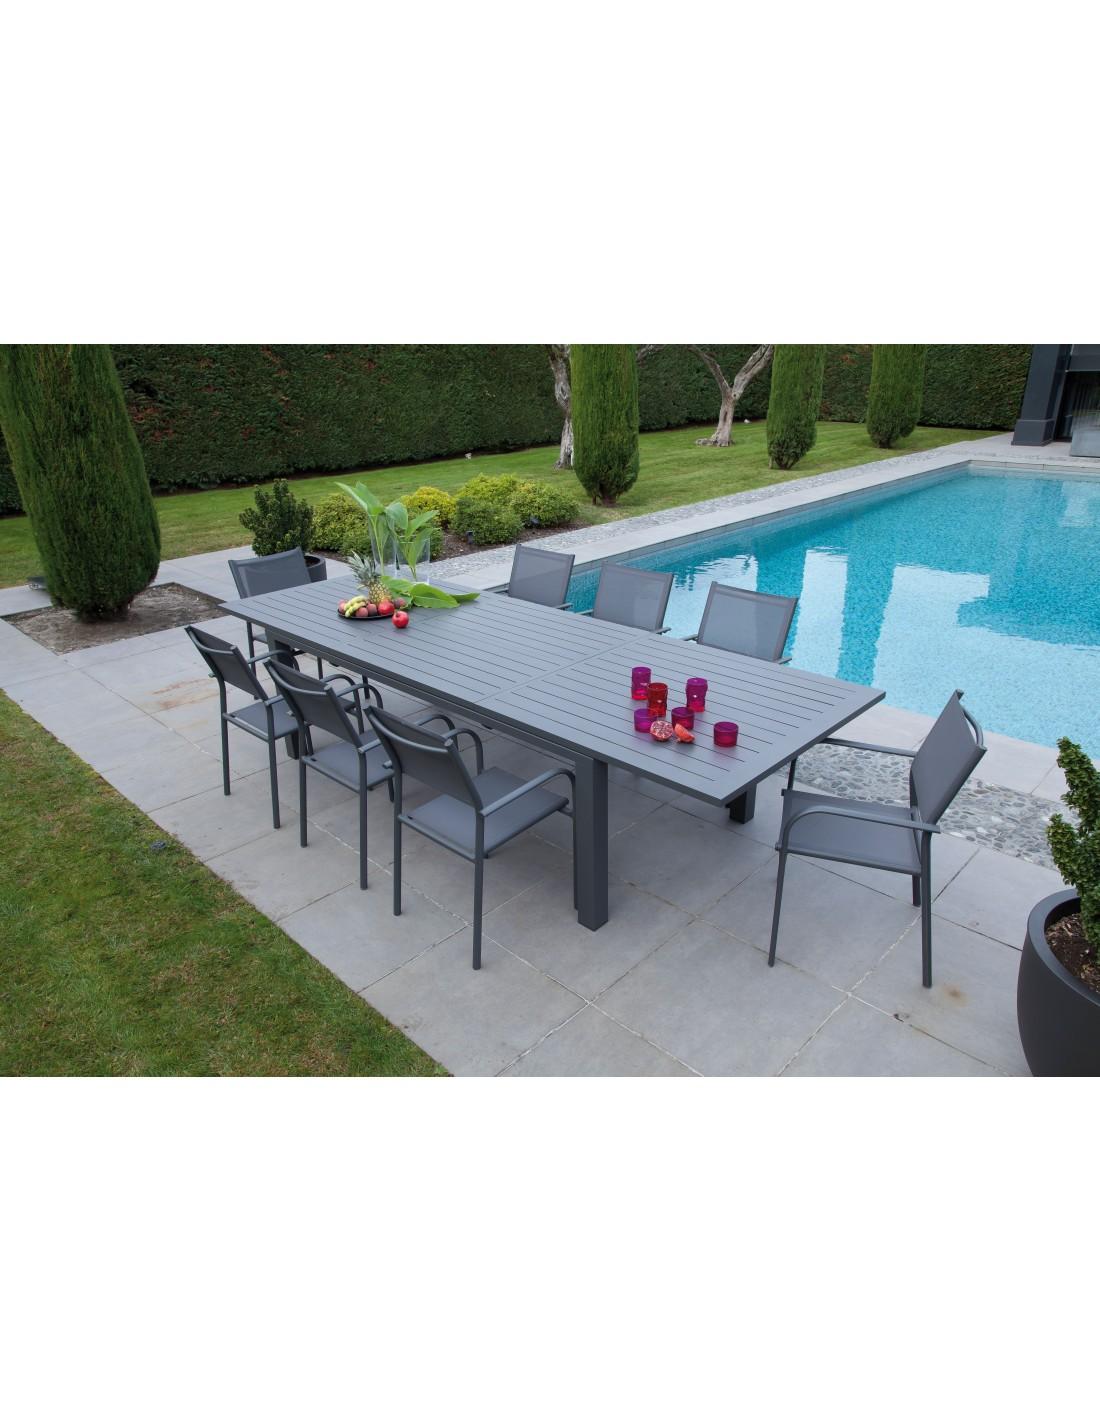 table de jardin elisa 220 320x109 cm en aluminium proloisirs. Black Bedroom Furniture Sets. Home Design Ideas